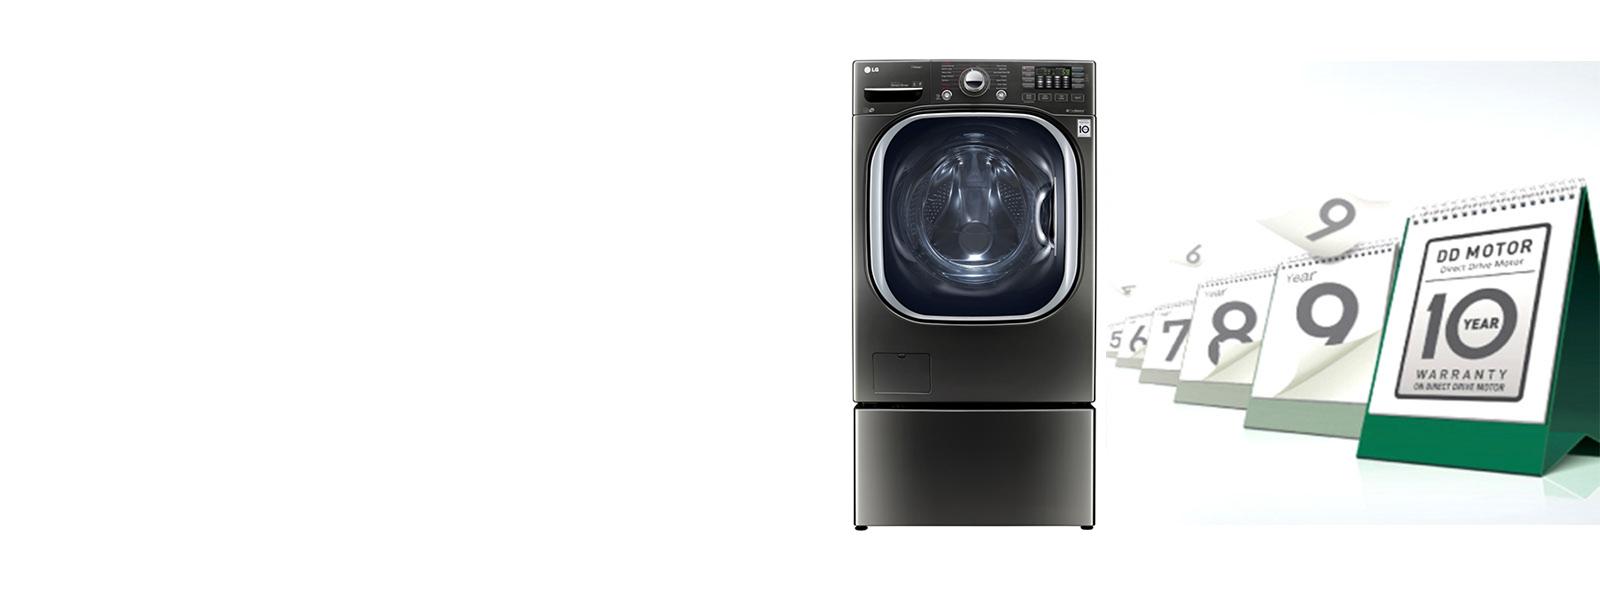 100 samsung wf50k7500av 27 inch black front load washer and